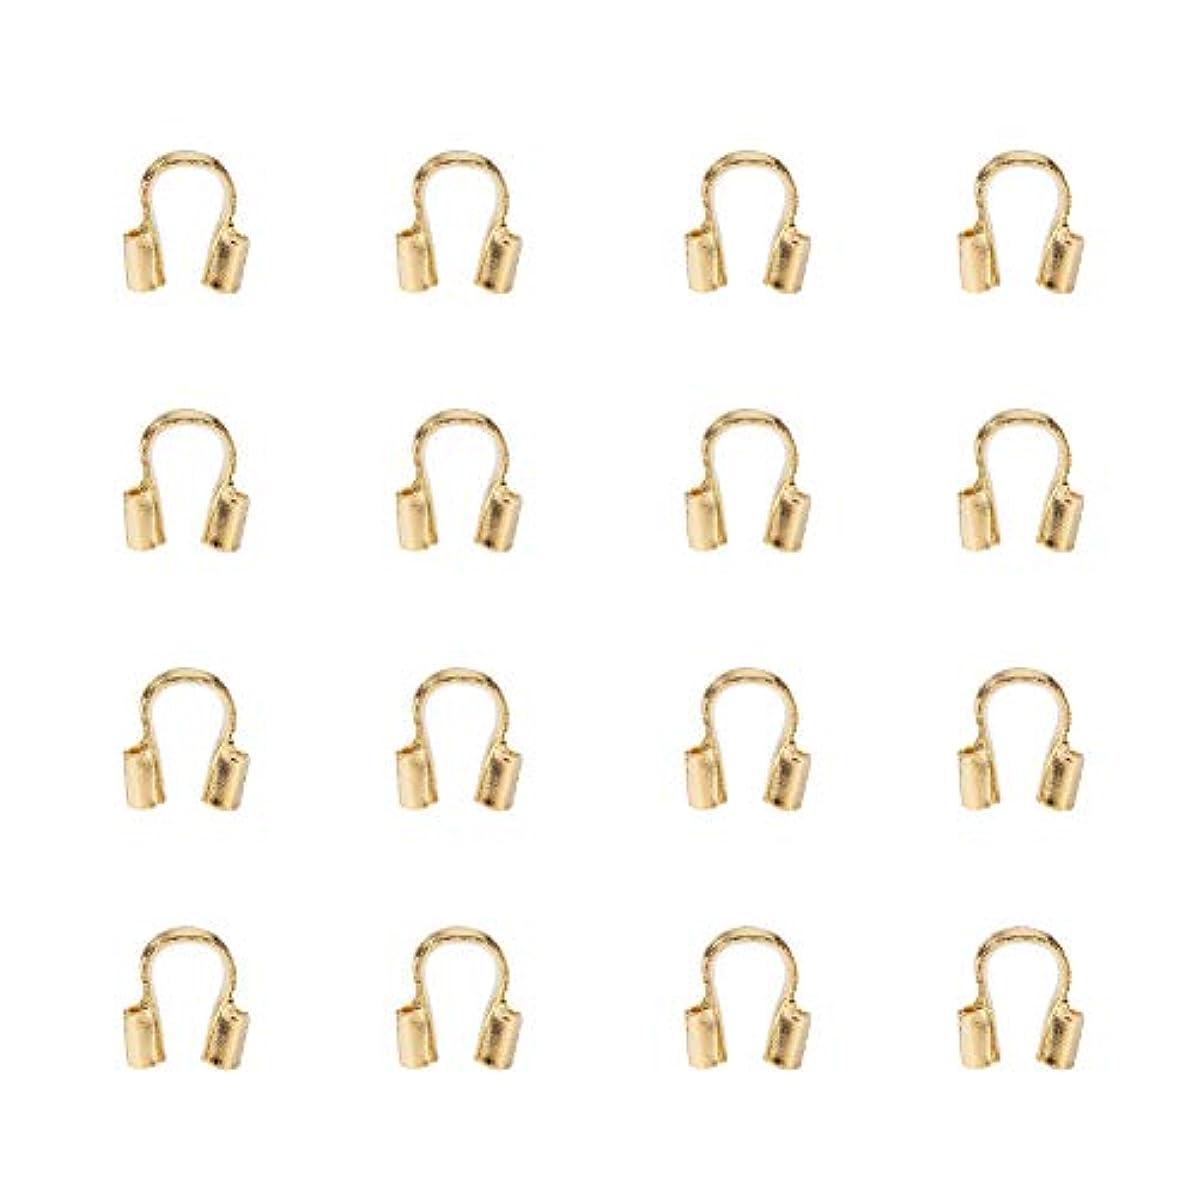 Pandahall 100PCS Golden Brass Wire Guardian Jewelry (4x5x1mm)